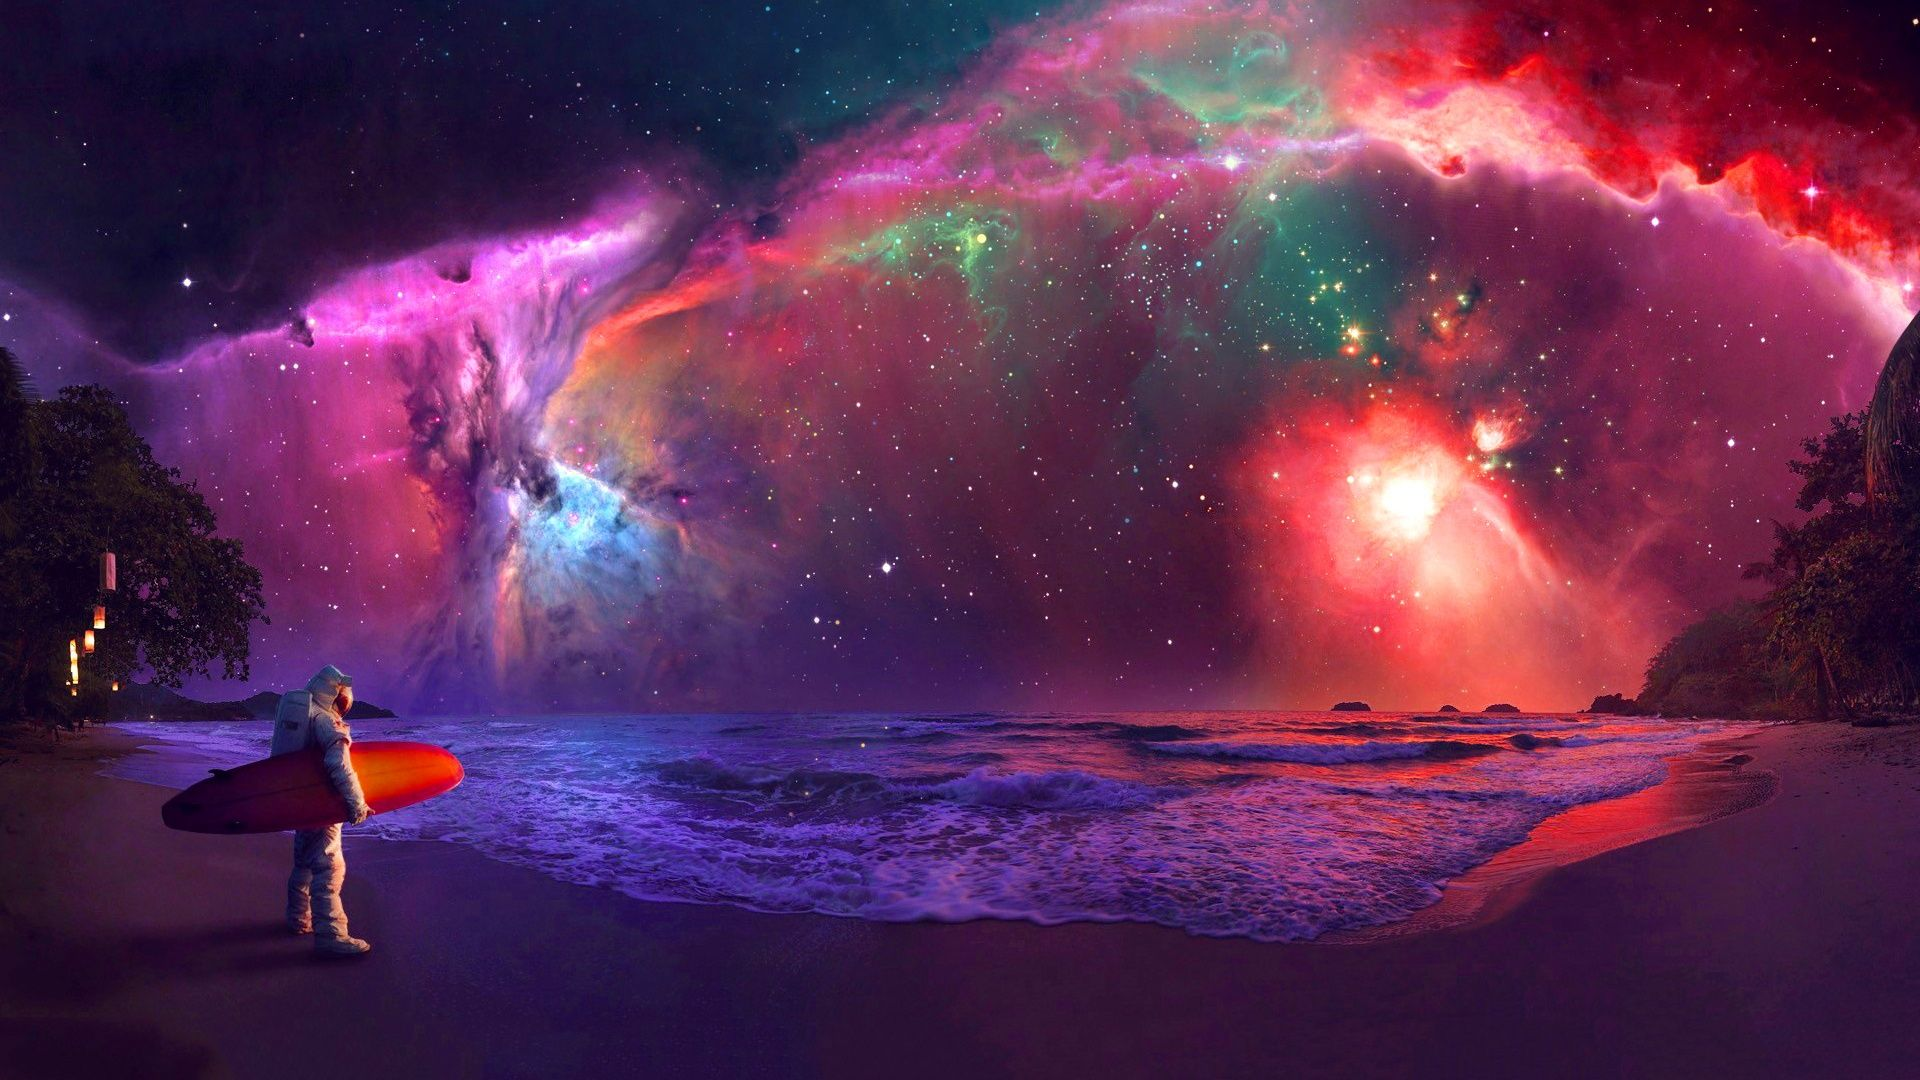 Andromeda Galaxy Astronaut Art Nebula Wallpaper Hd Galaxy Wallpaper Galaxy Wallpaper